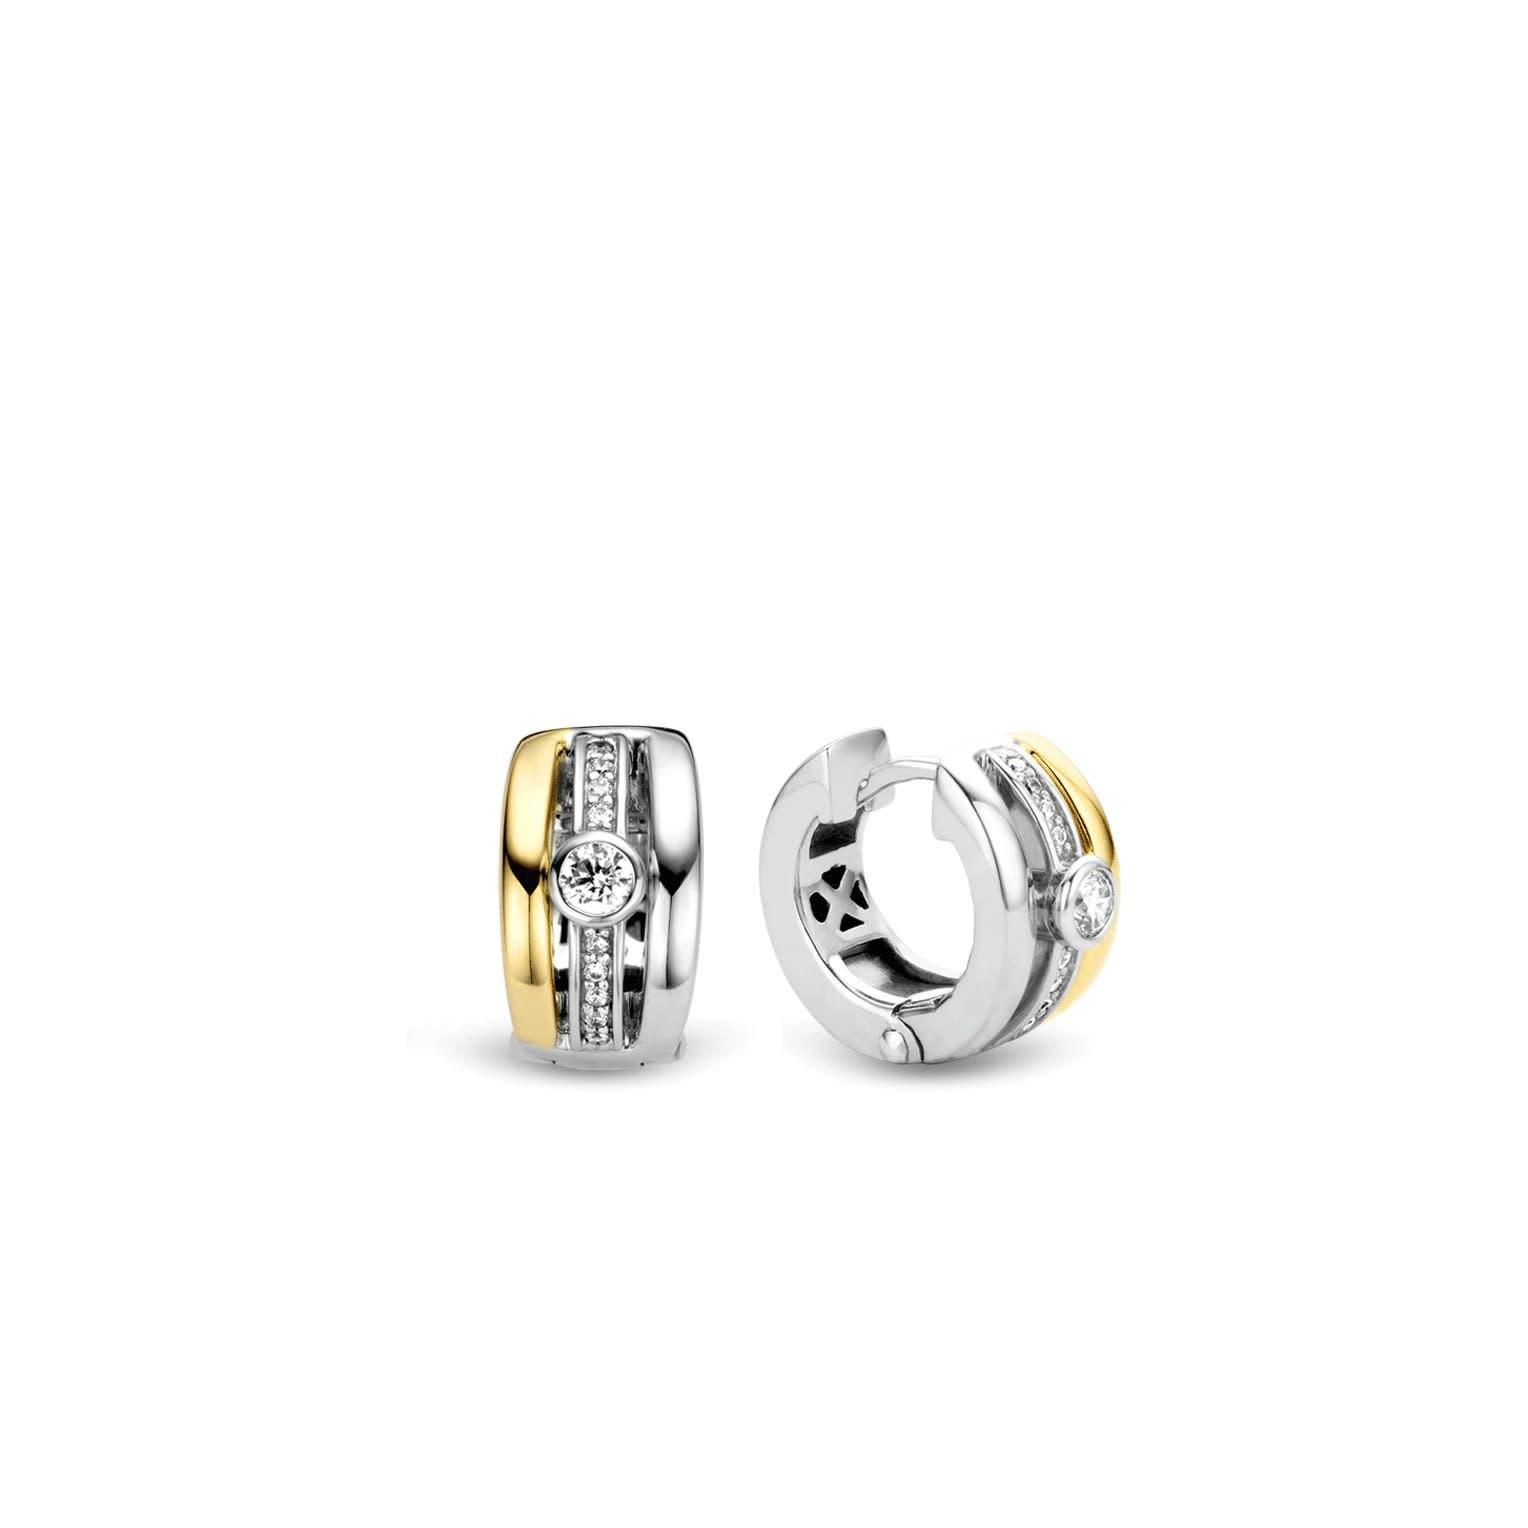 TI SENTO - Milano Earrings 7754ZY-2